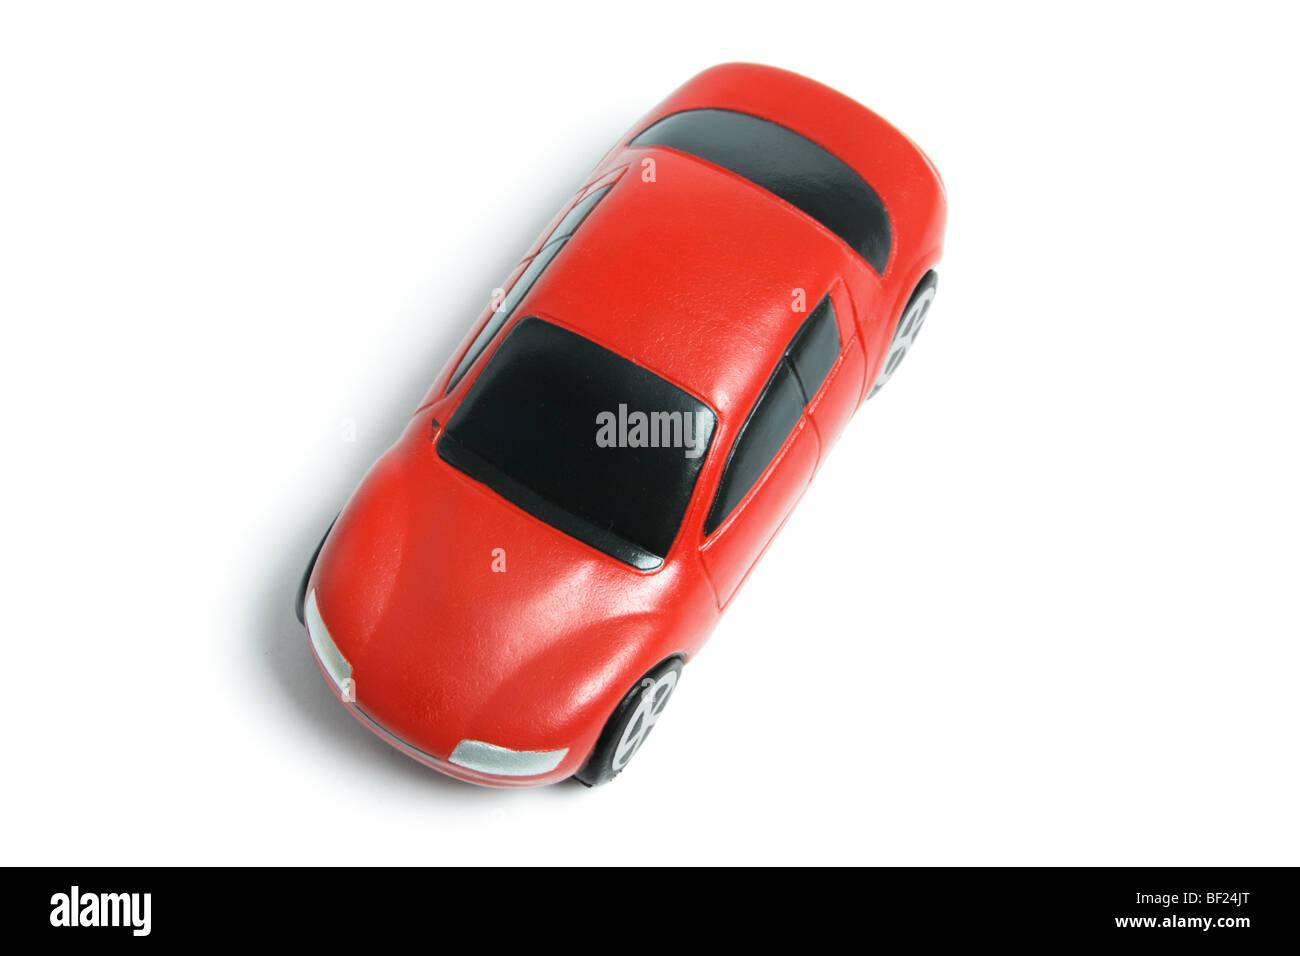 Miniature Car - Stock Image